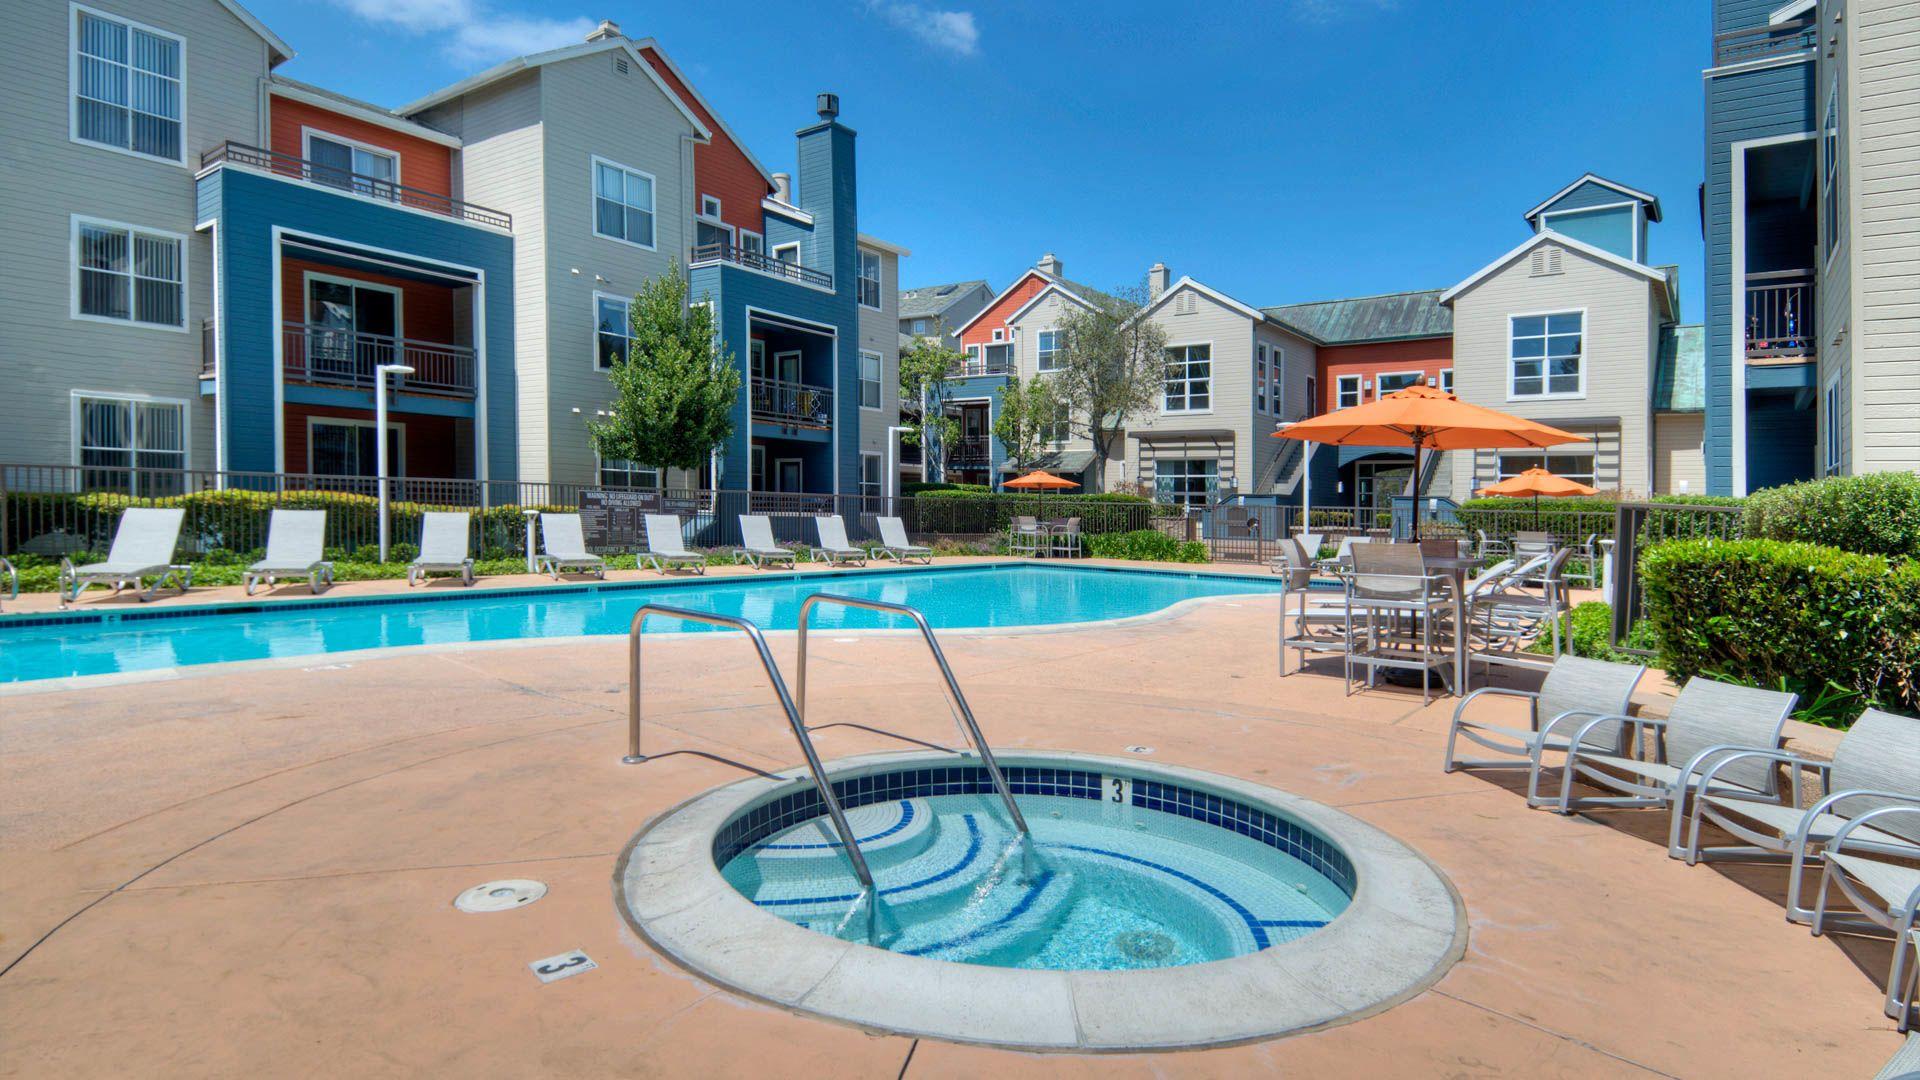 City Gate at Cupertino Apartments - Swimming Pool and Hot Tub